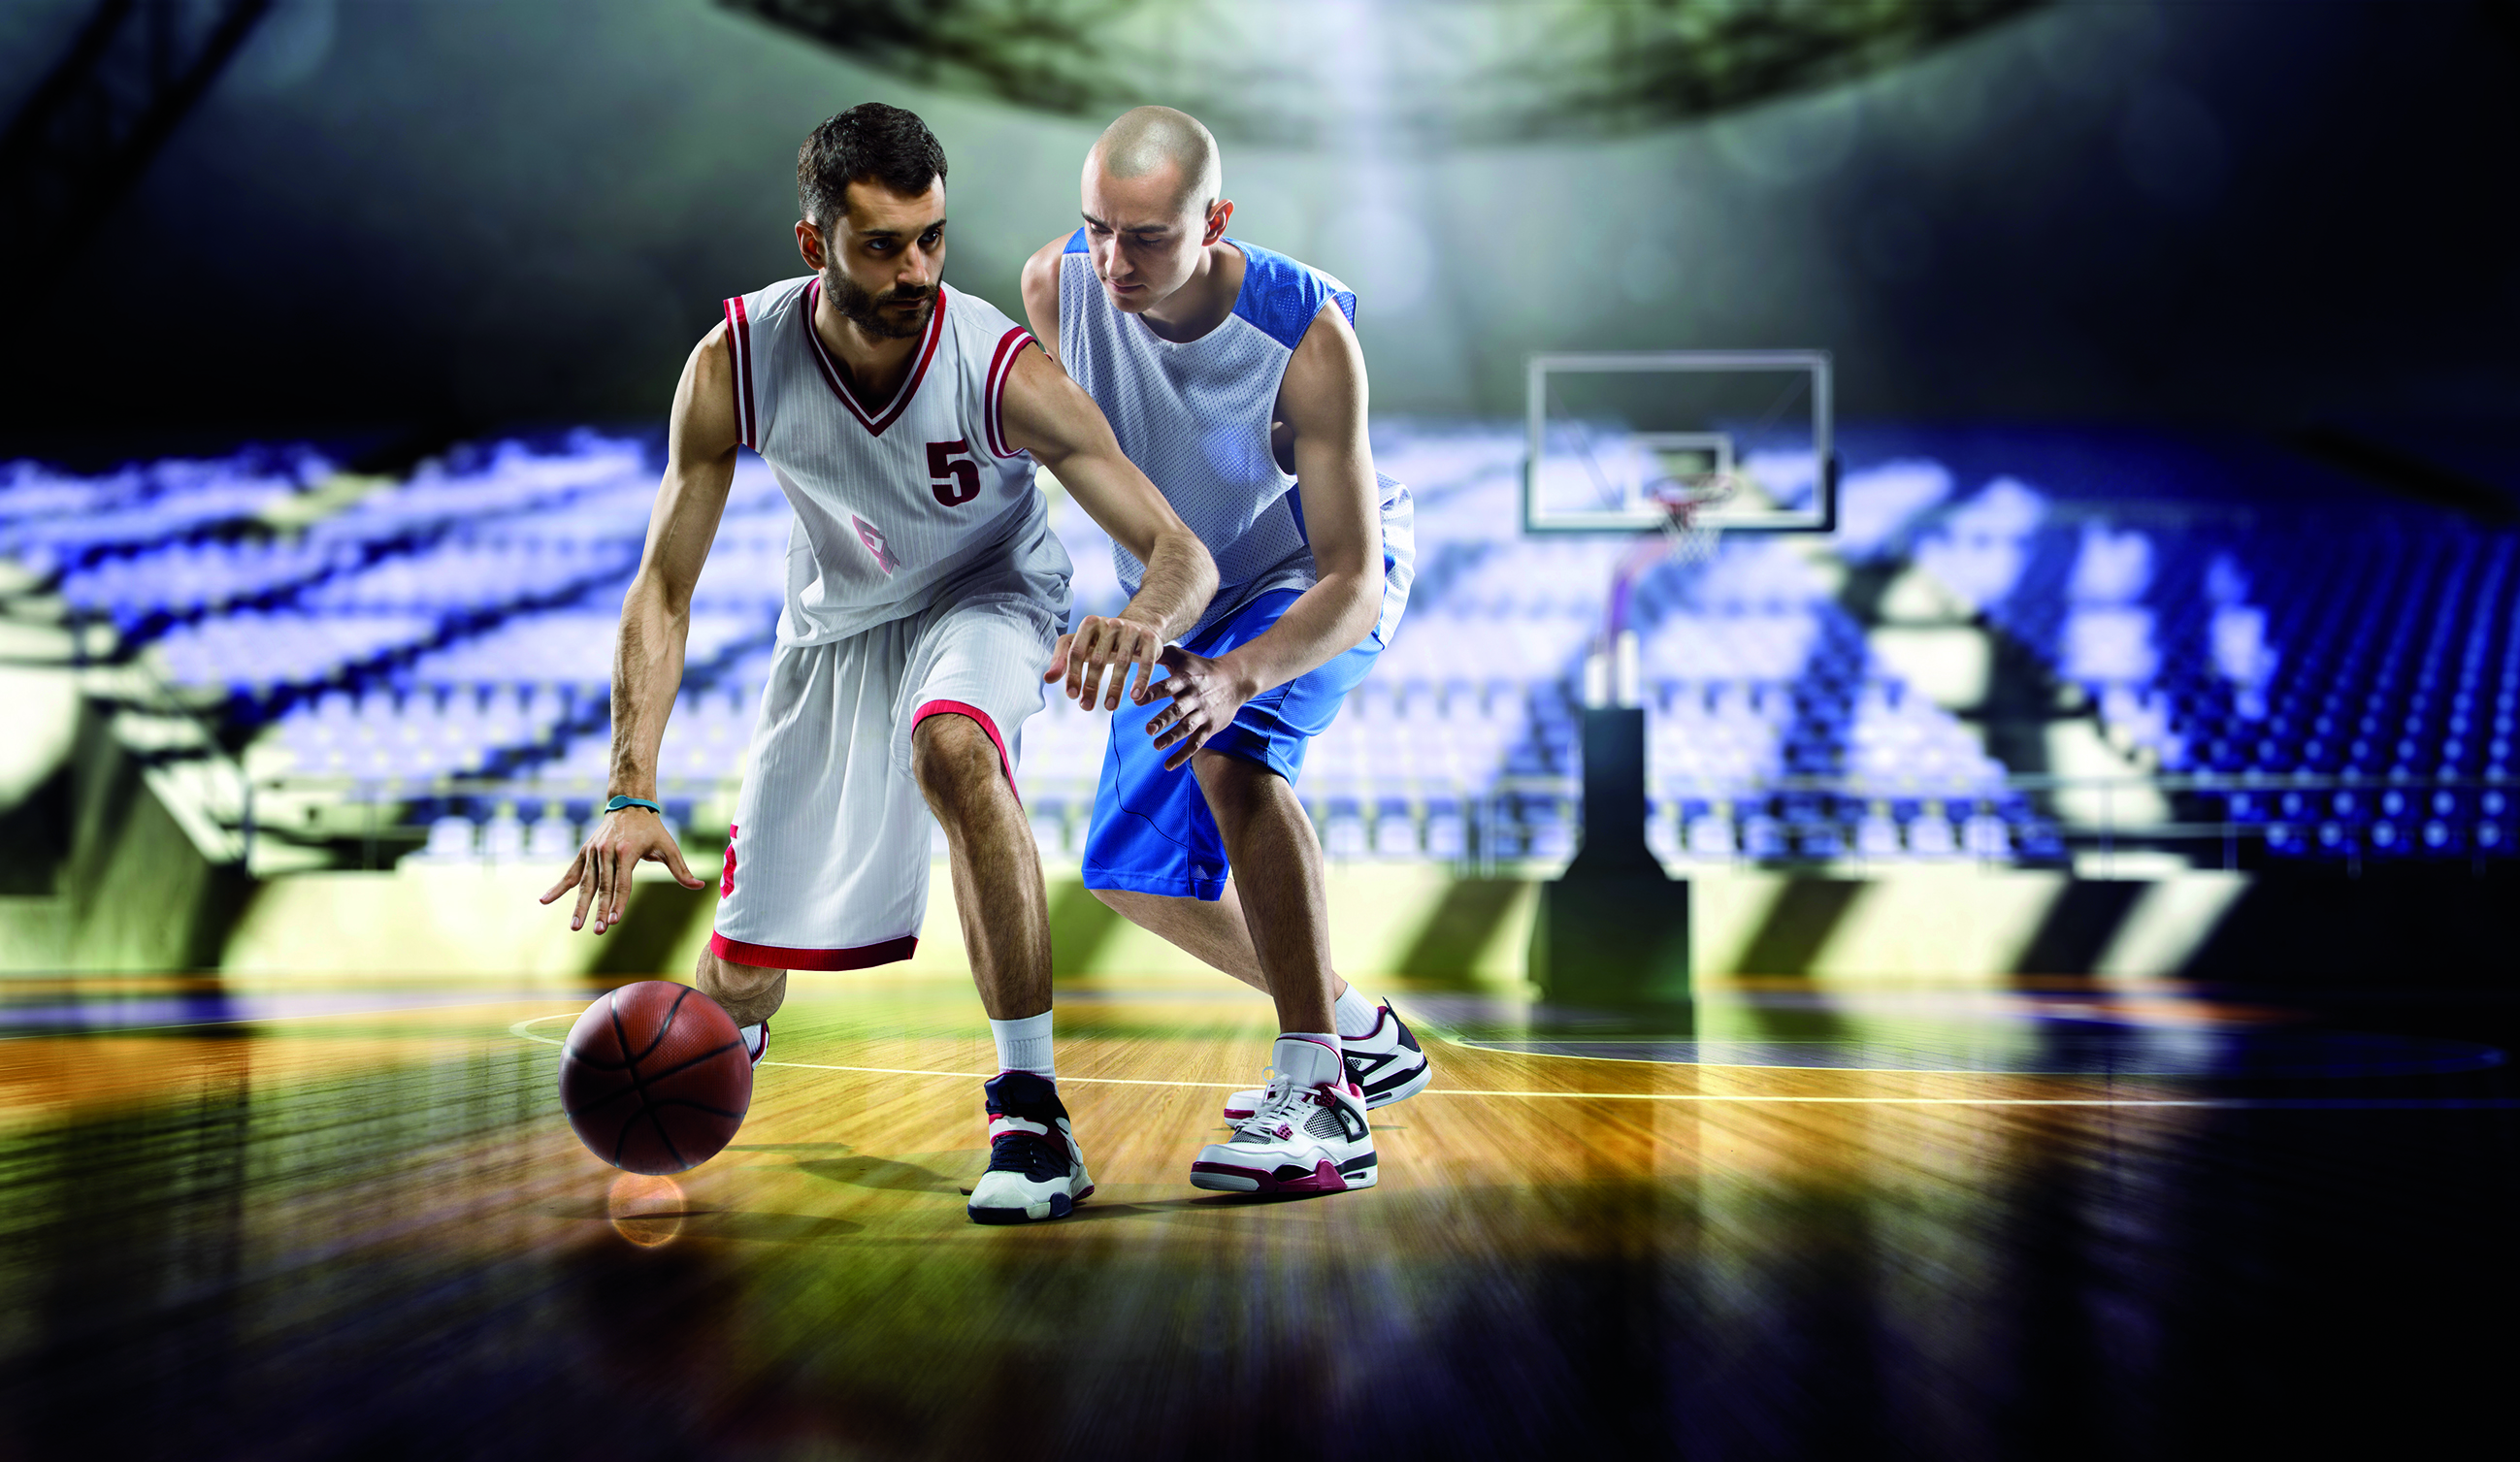 Sports Engineers - basketball